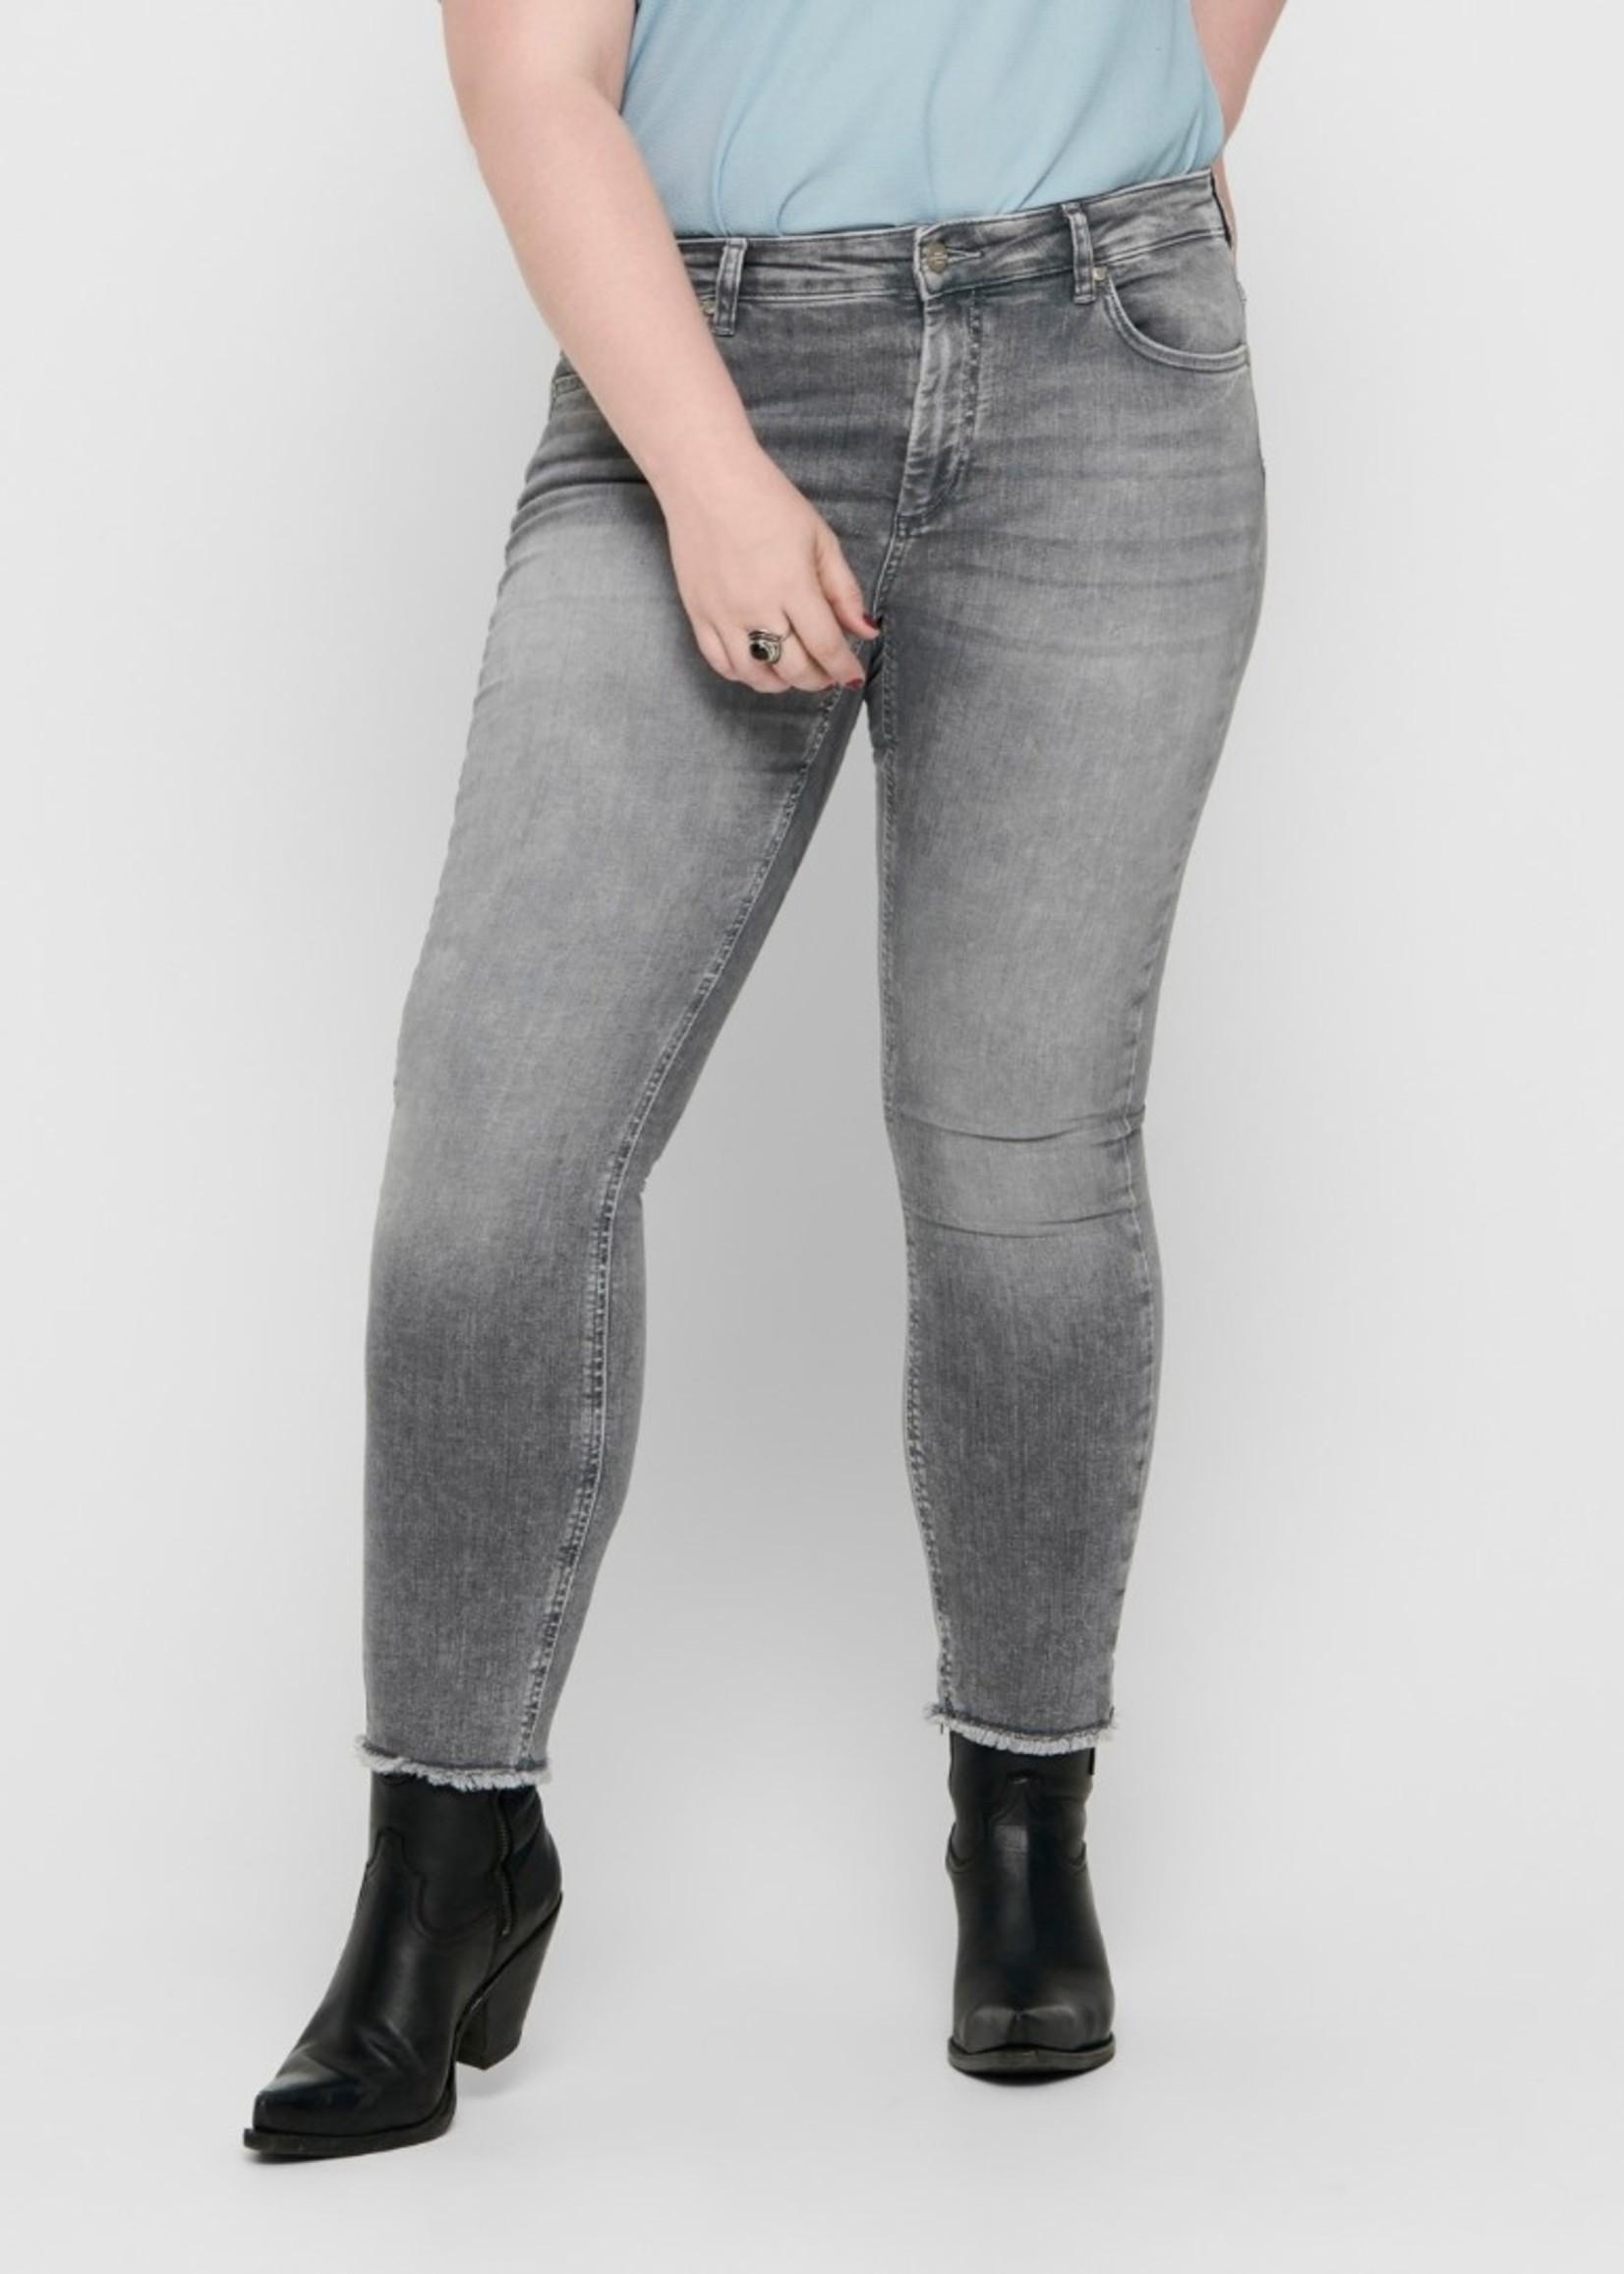 Only Carmakoma Only Carmakoma Willy Jeans